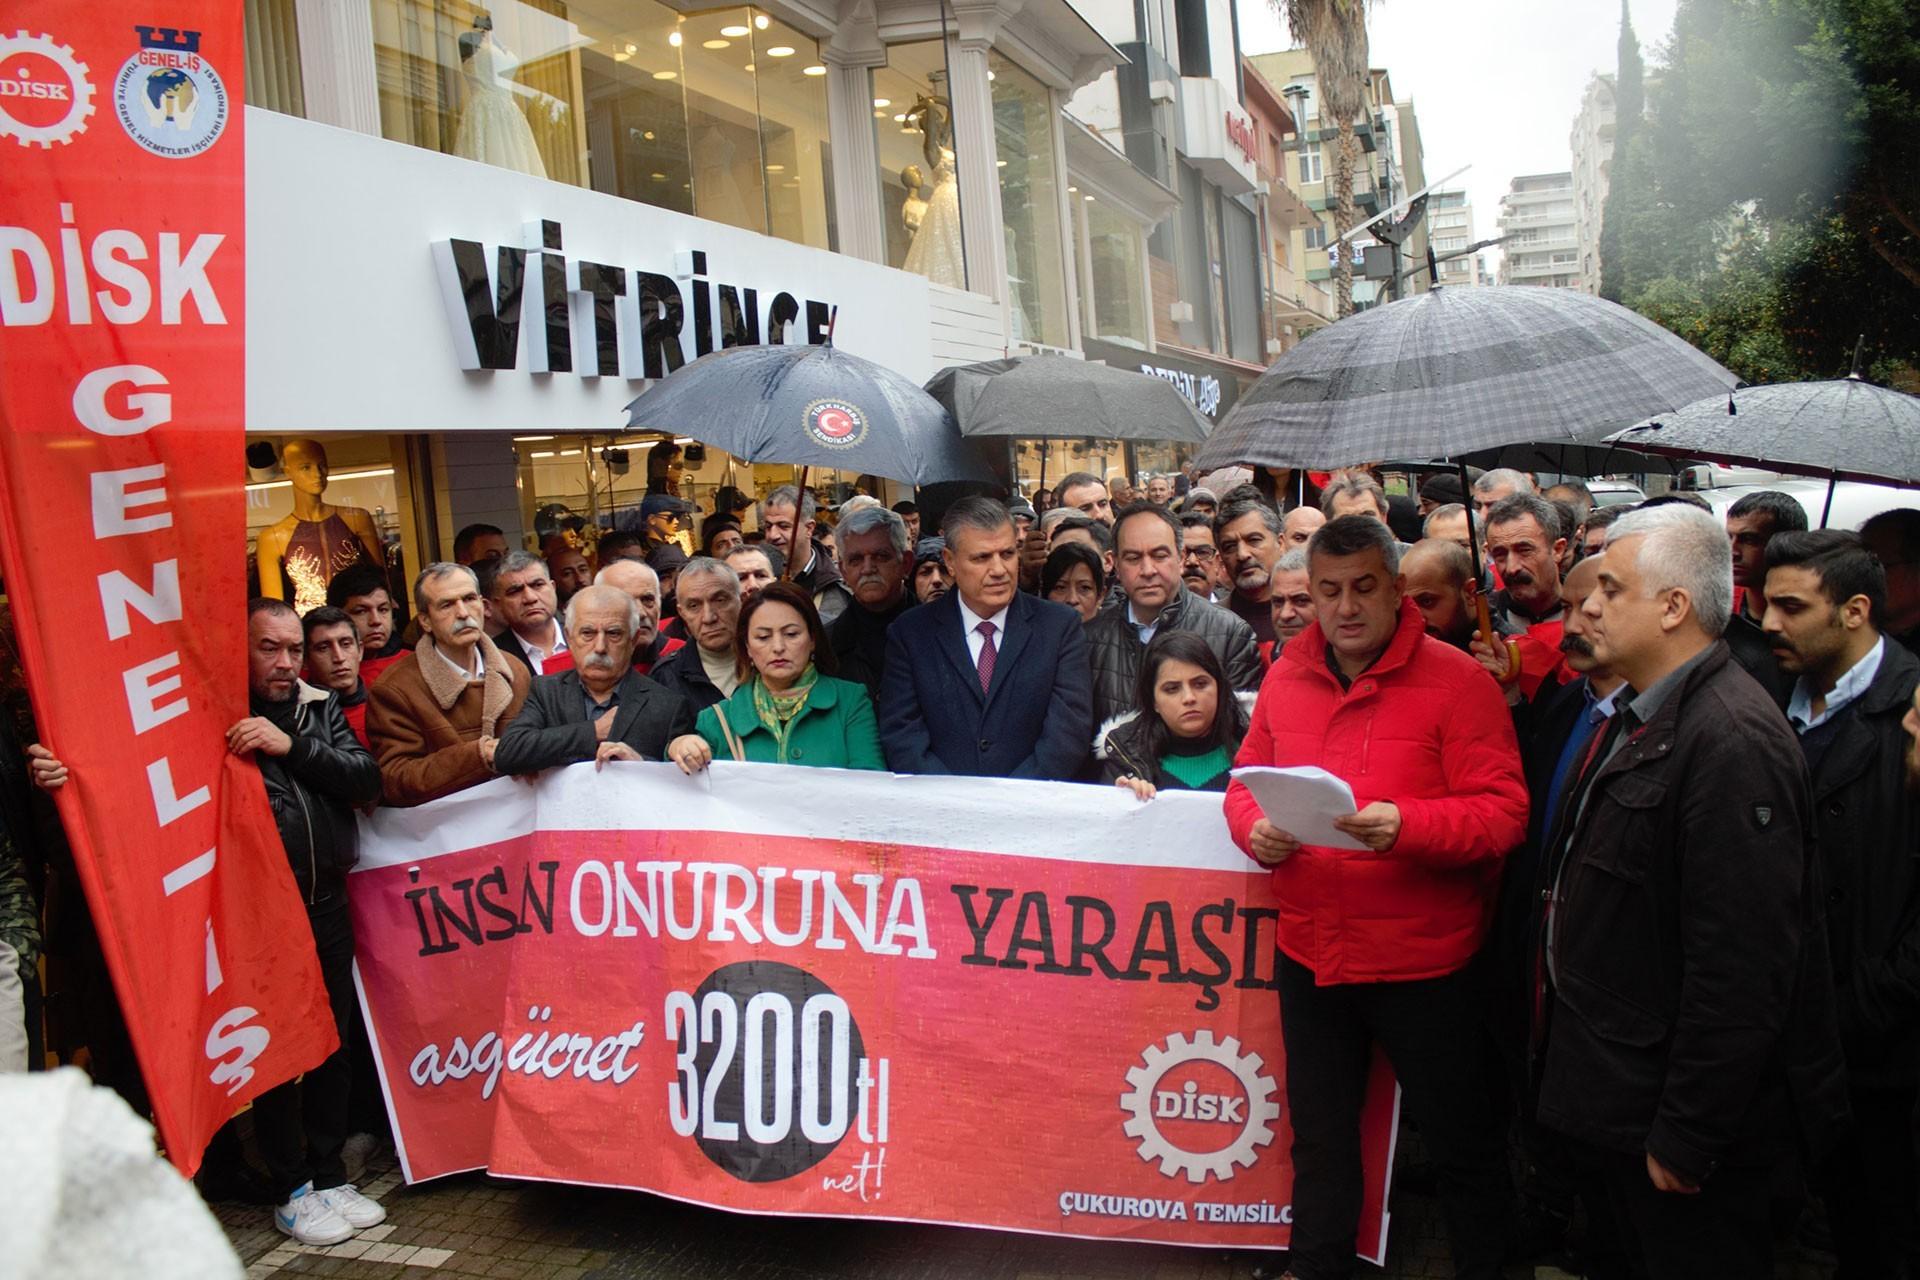 DİSK'in Adana'daki asgari ücret eylemi